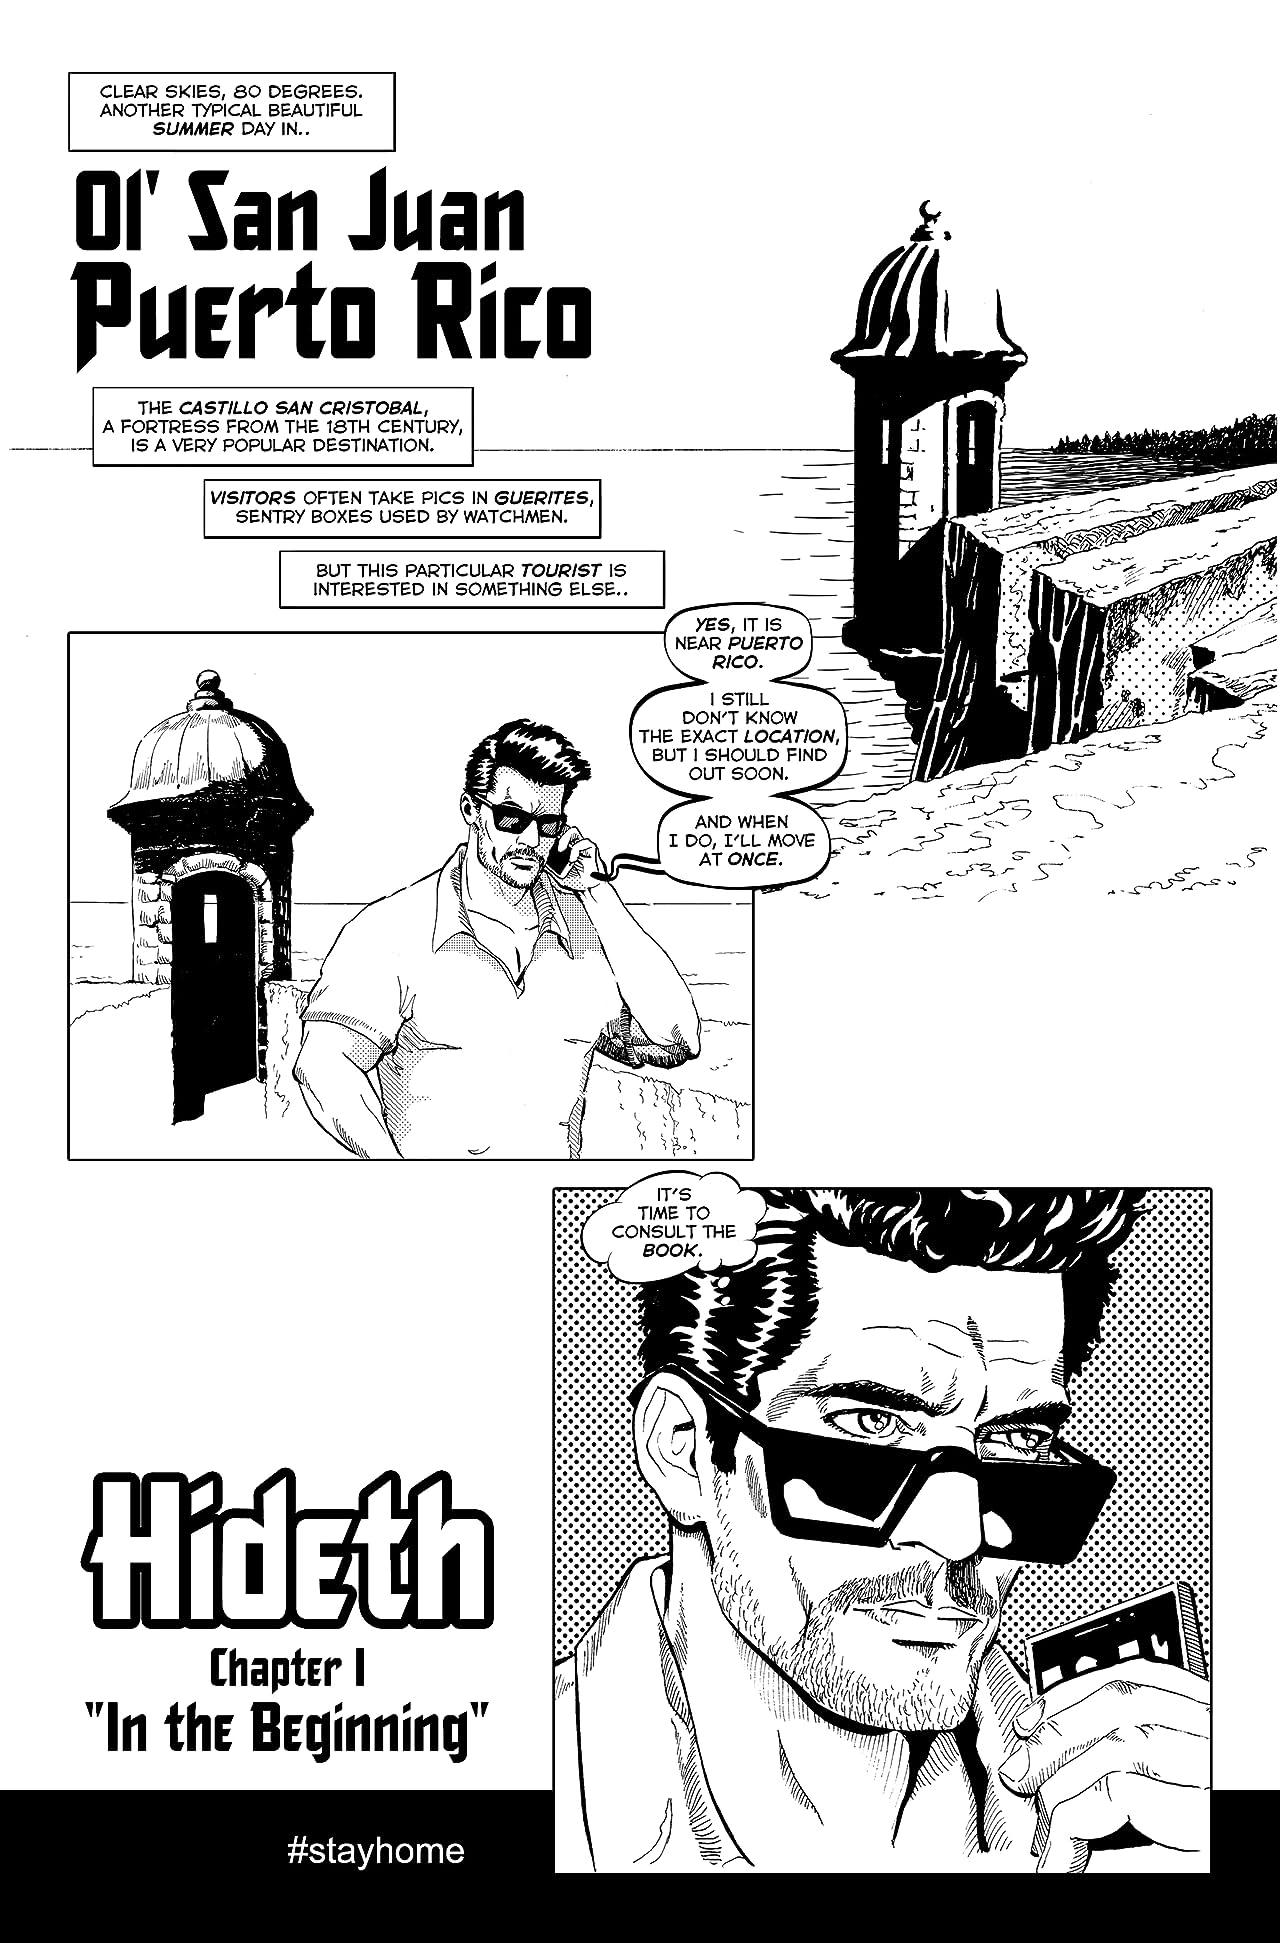 Hideth #1